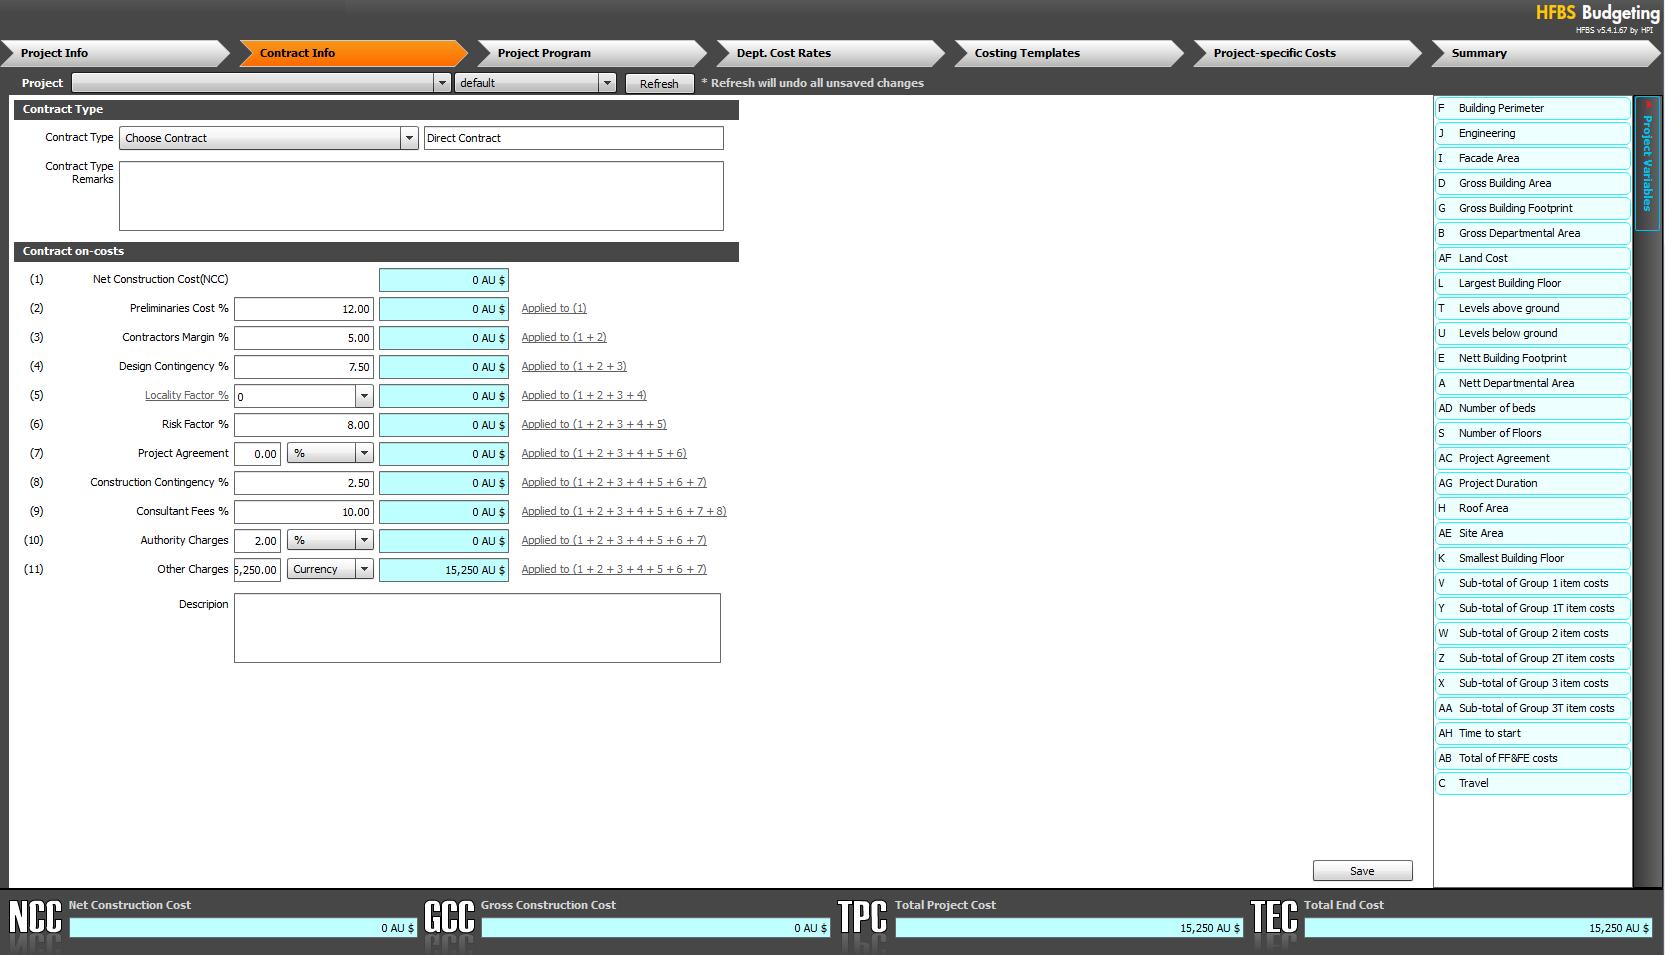 hfbs-modules-imac-8-Budgeting